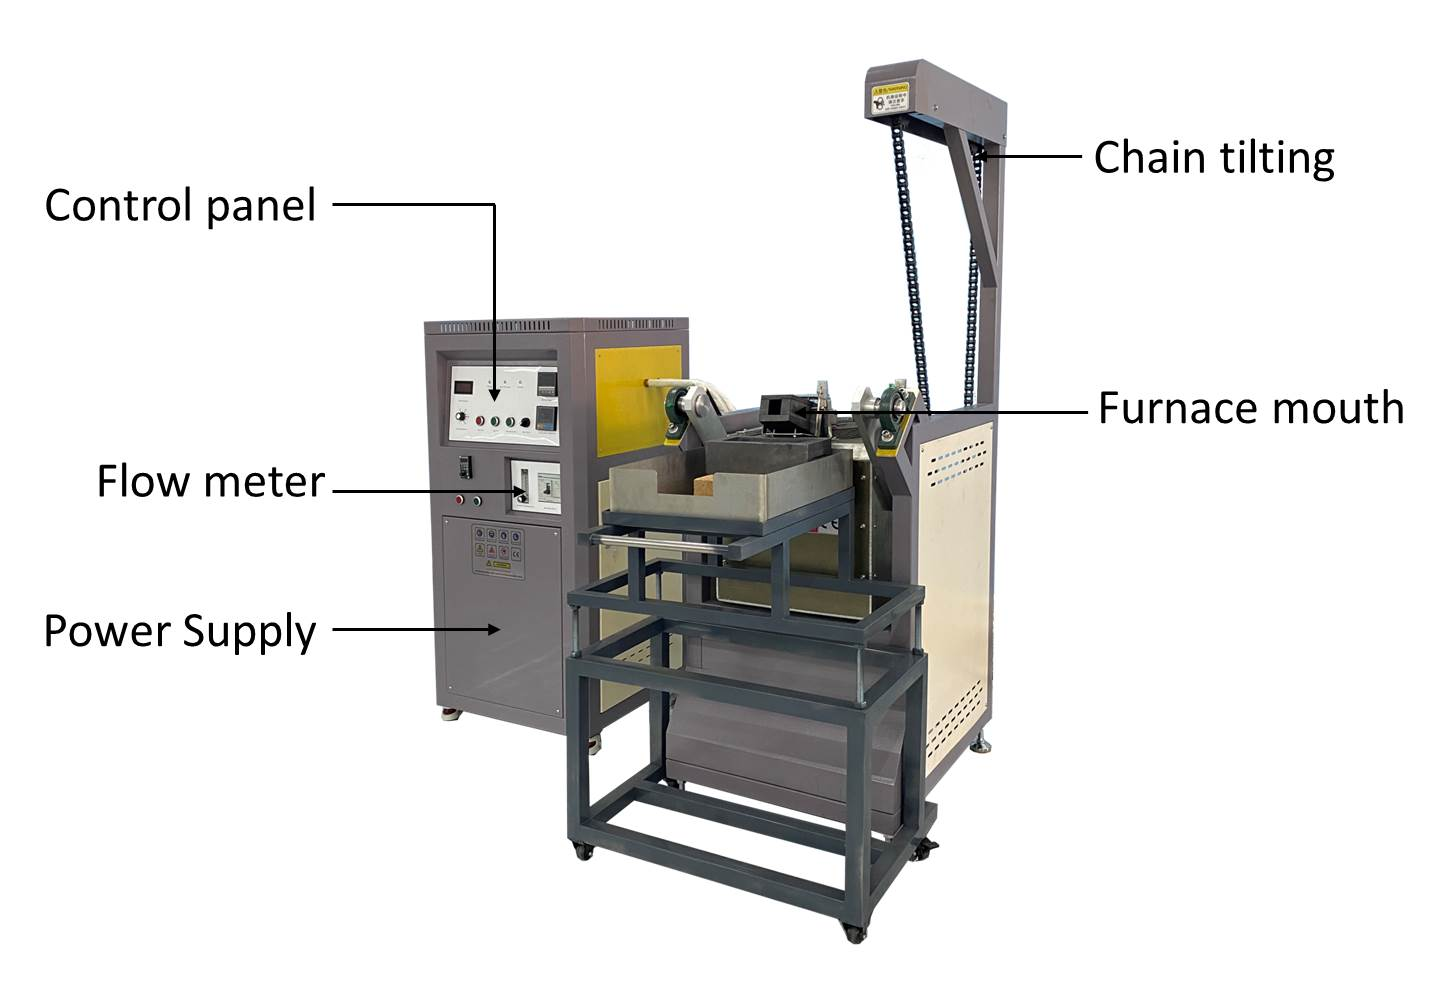 chain motor tilting melting machine details